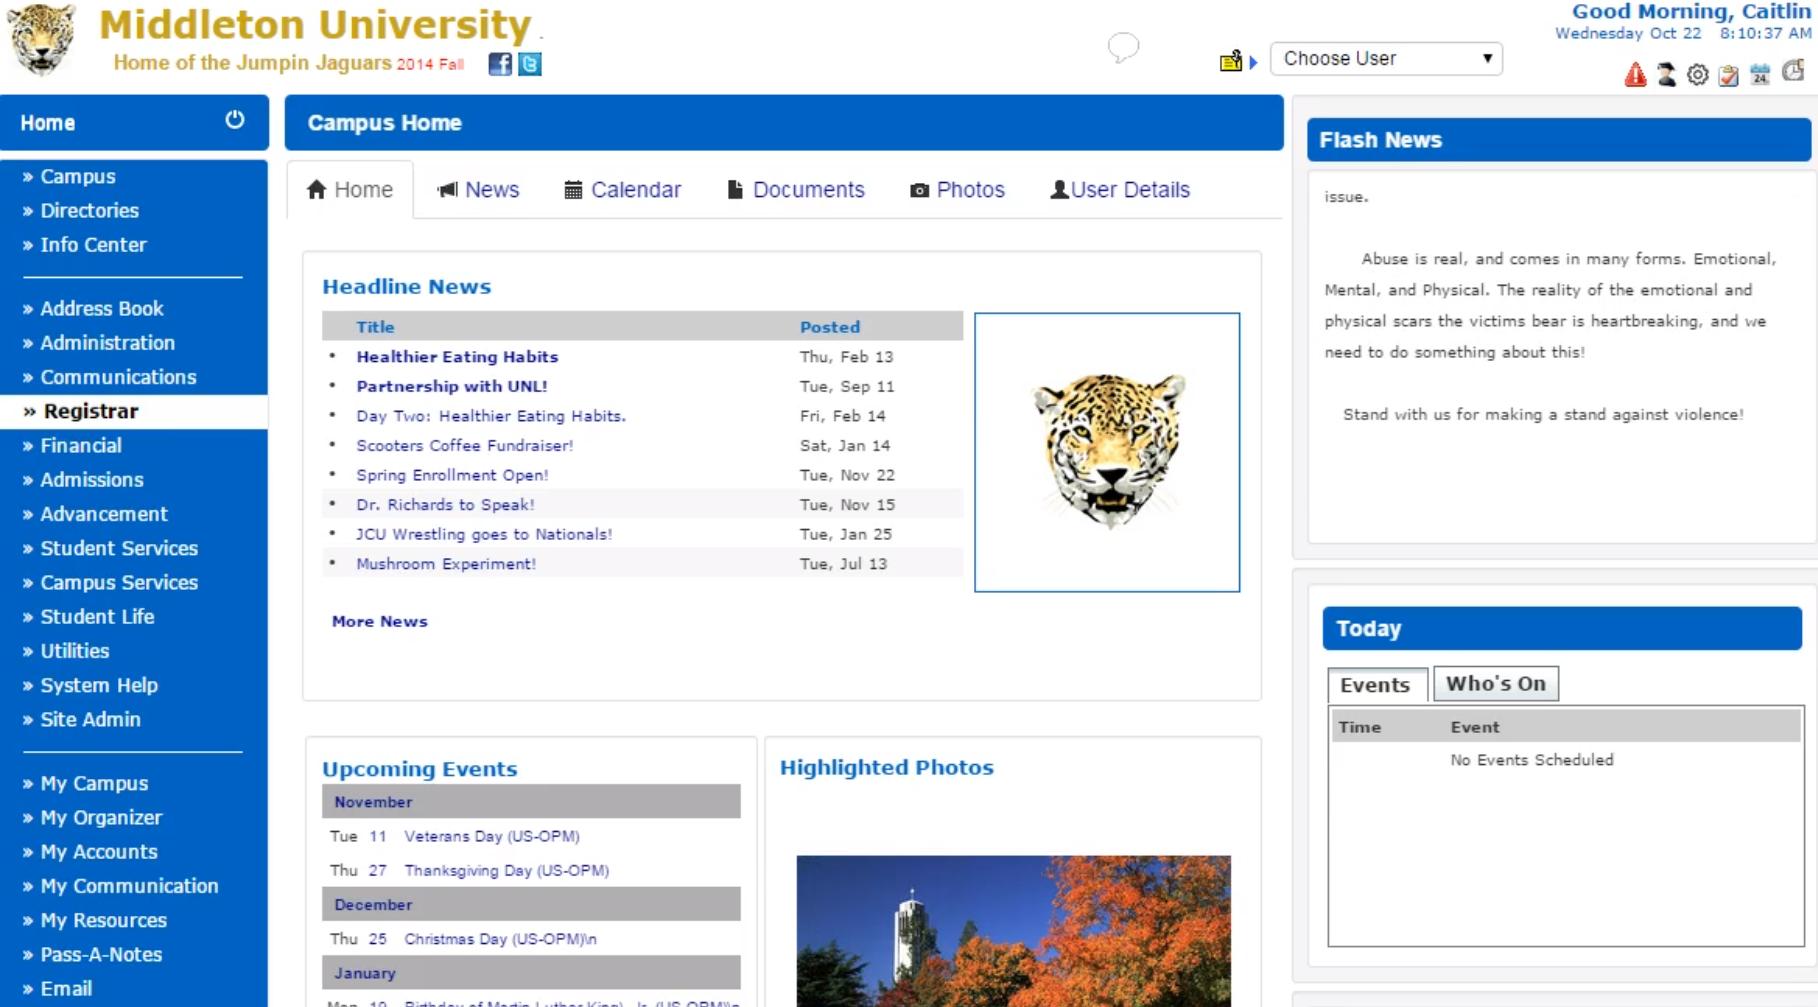 Sycamore Campus main interface